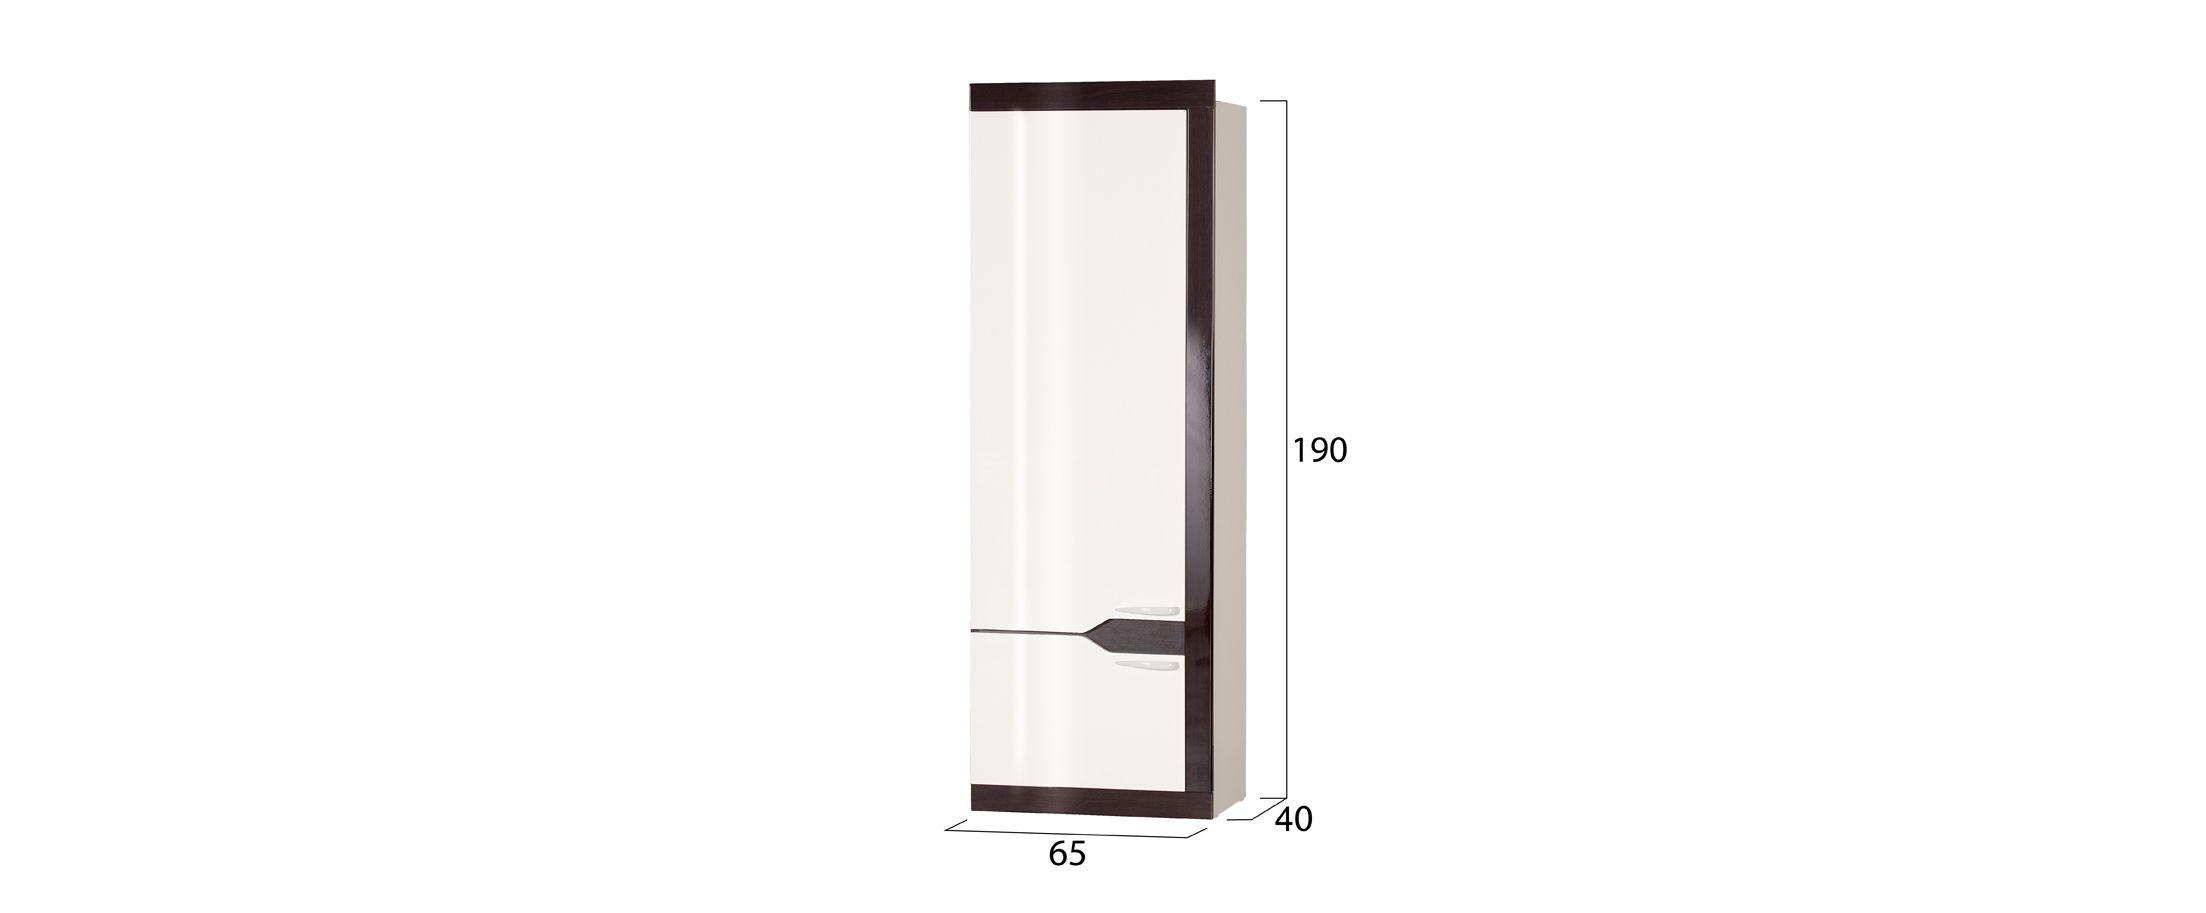 Шкаф для одежды Ронда 300